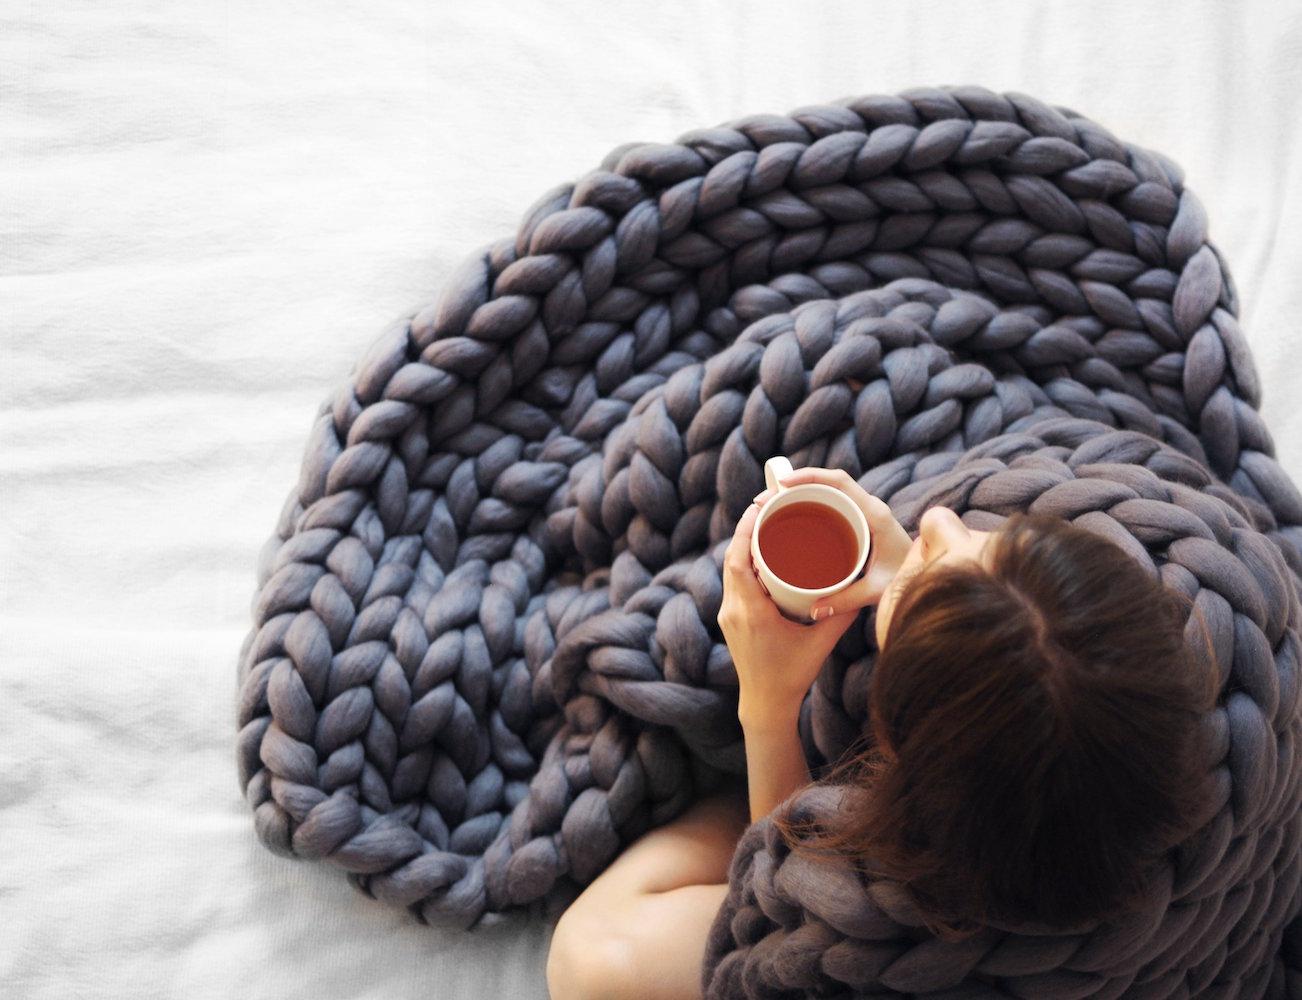 Grande Punto Merino Blanket by Ohhio